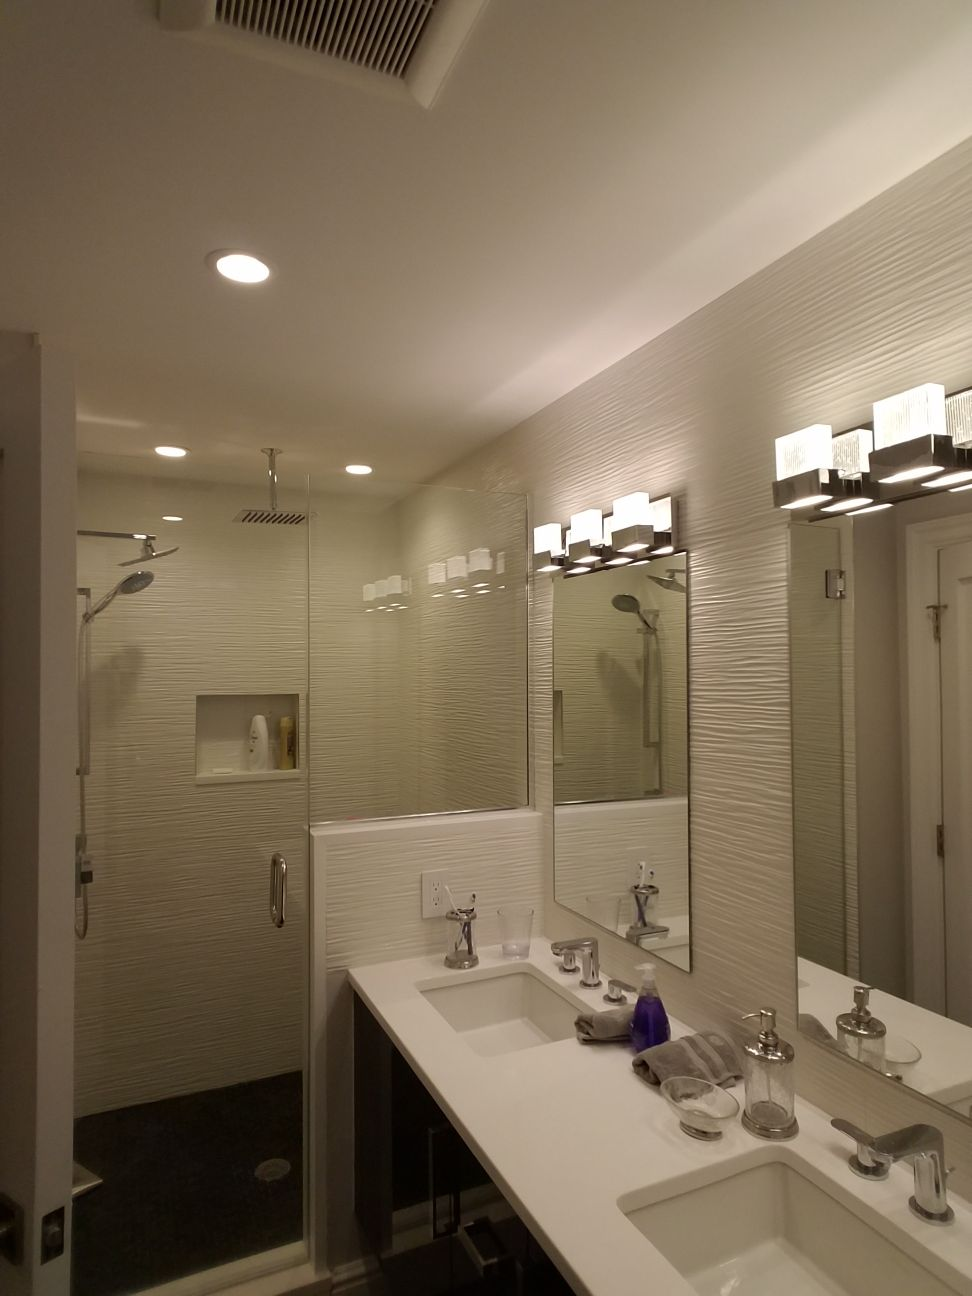 Bathroom 8.19.31 PM (2).jpeg